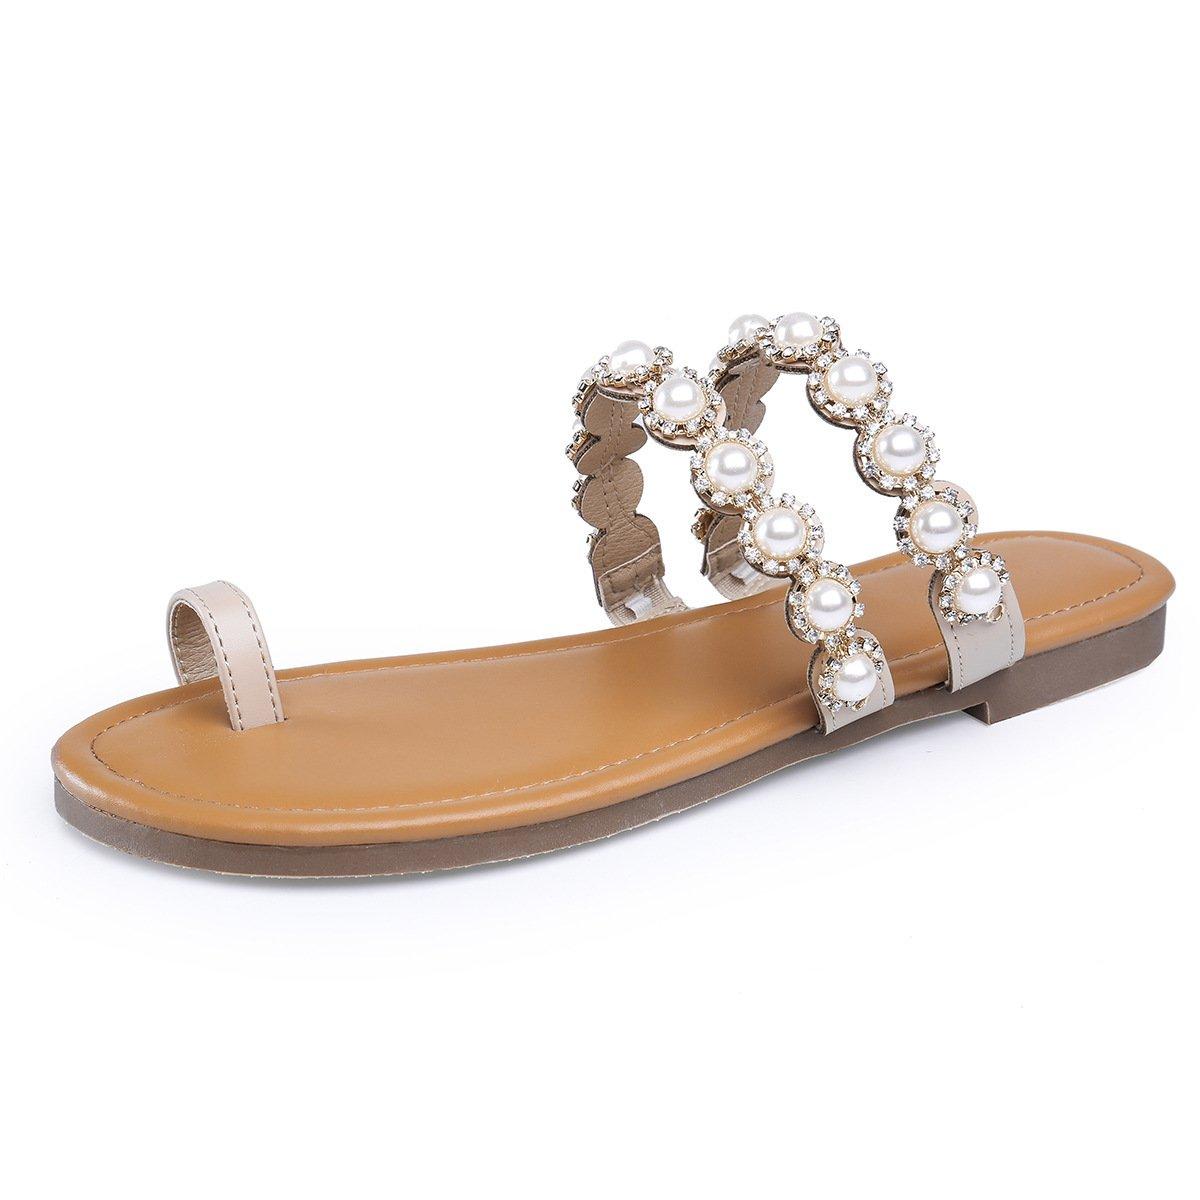 ZHZNVX Flache Unterseite Clip Pin coole Hausschuhe Rom clip Toe Sandalen Flachbild-Clip Pin coole Hausschuhe stilvolle Frau Schuhe die Talsohle mit Rollrand